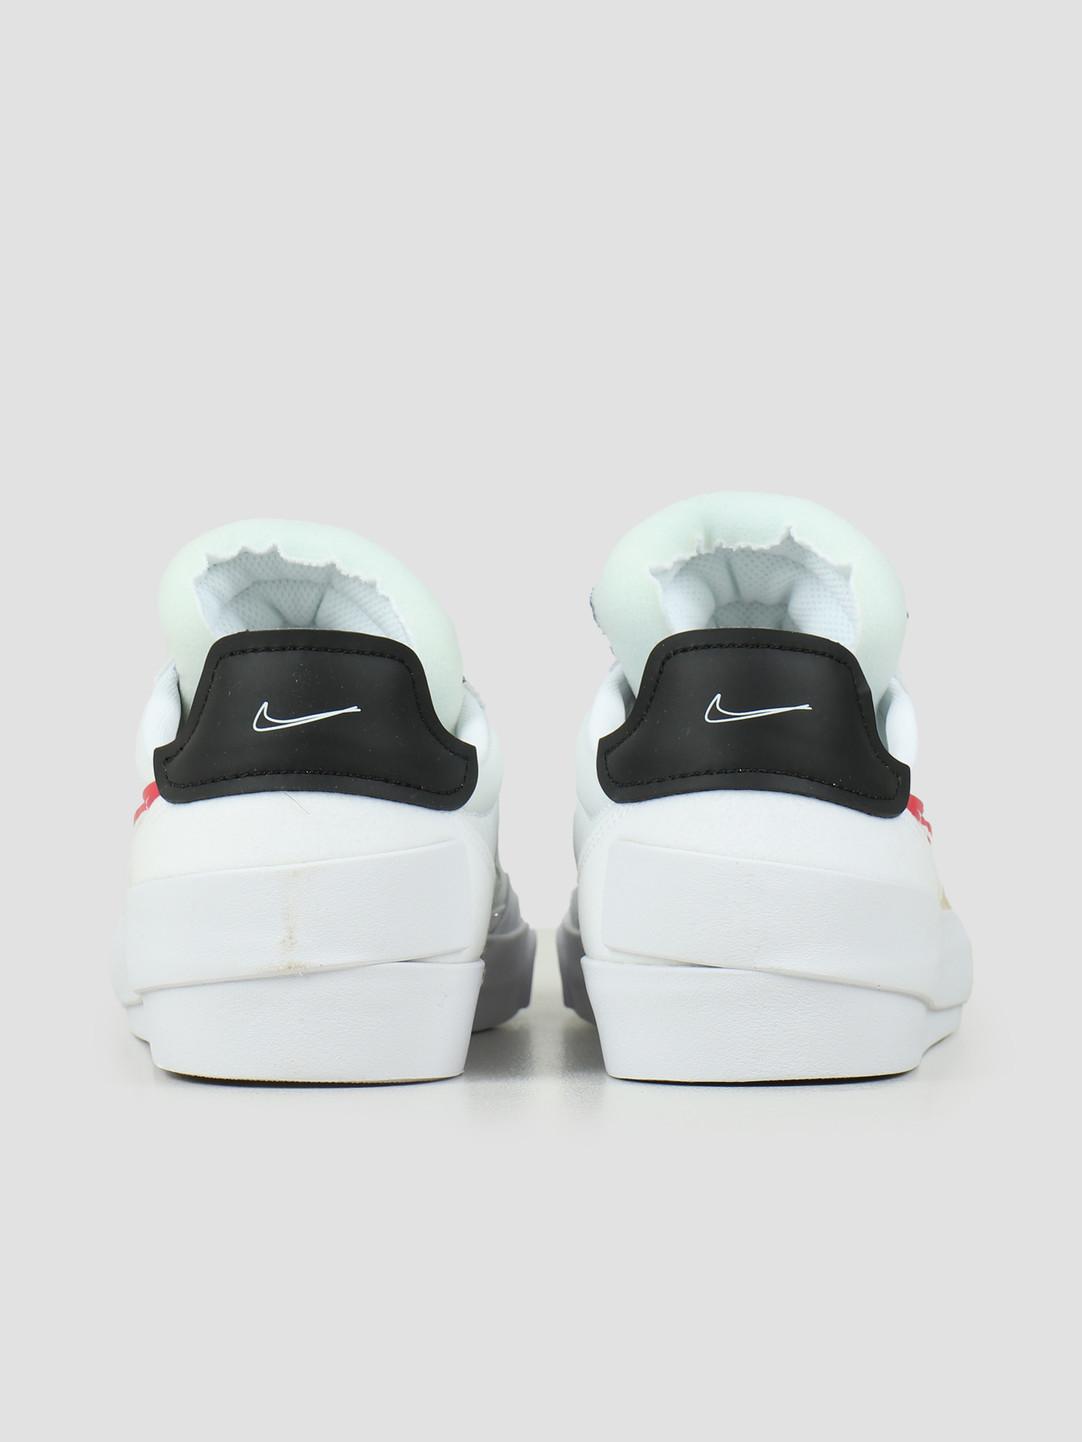 Nike Nike Drop Type Hbr White University Red Deep Royal Blue CQ0989-100